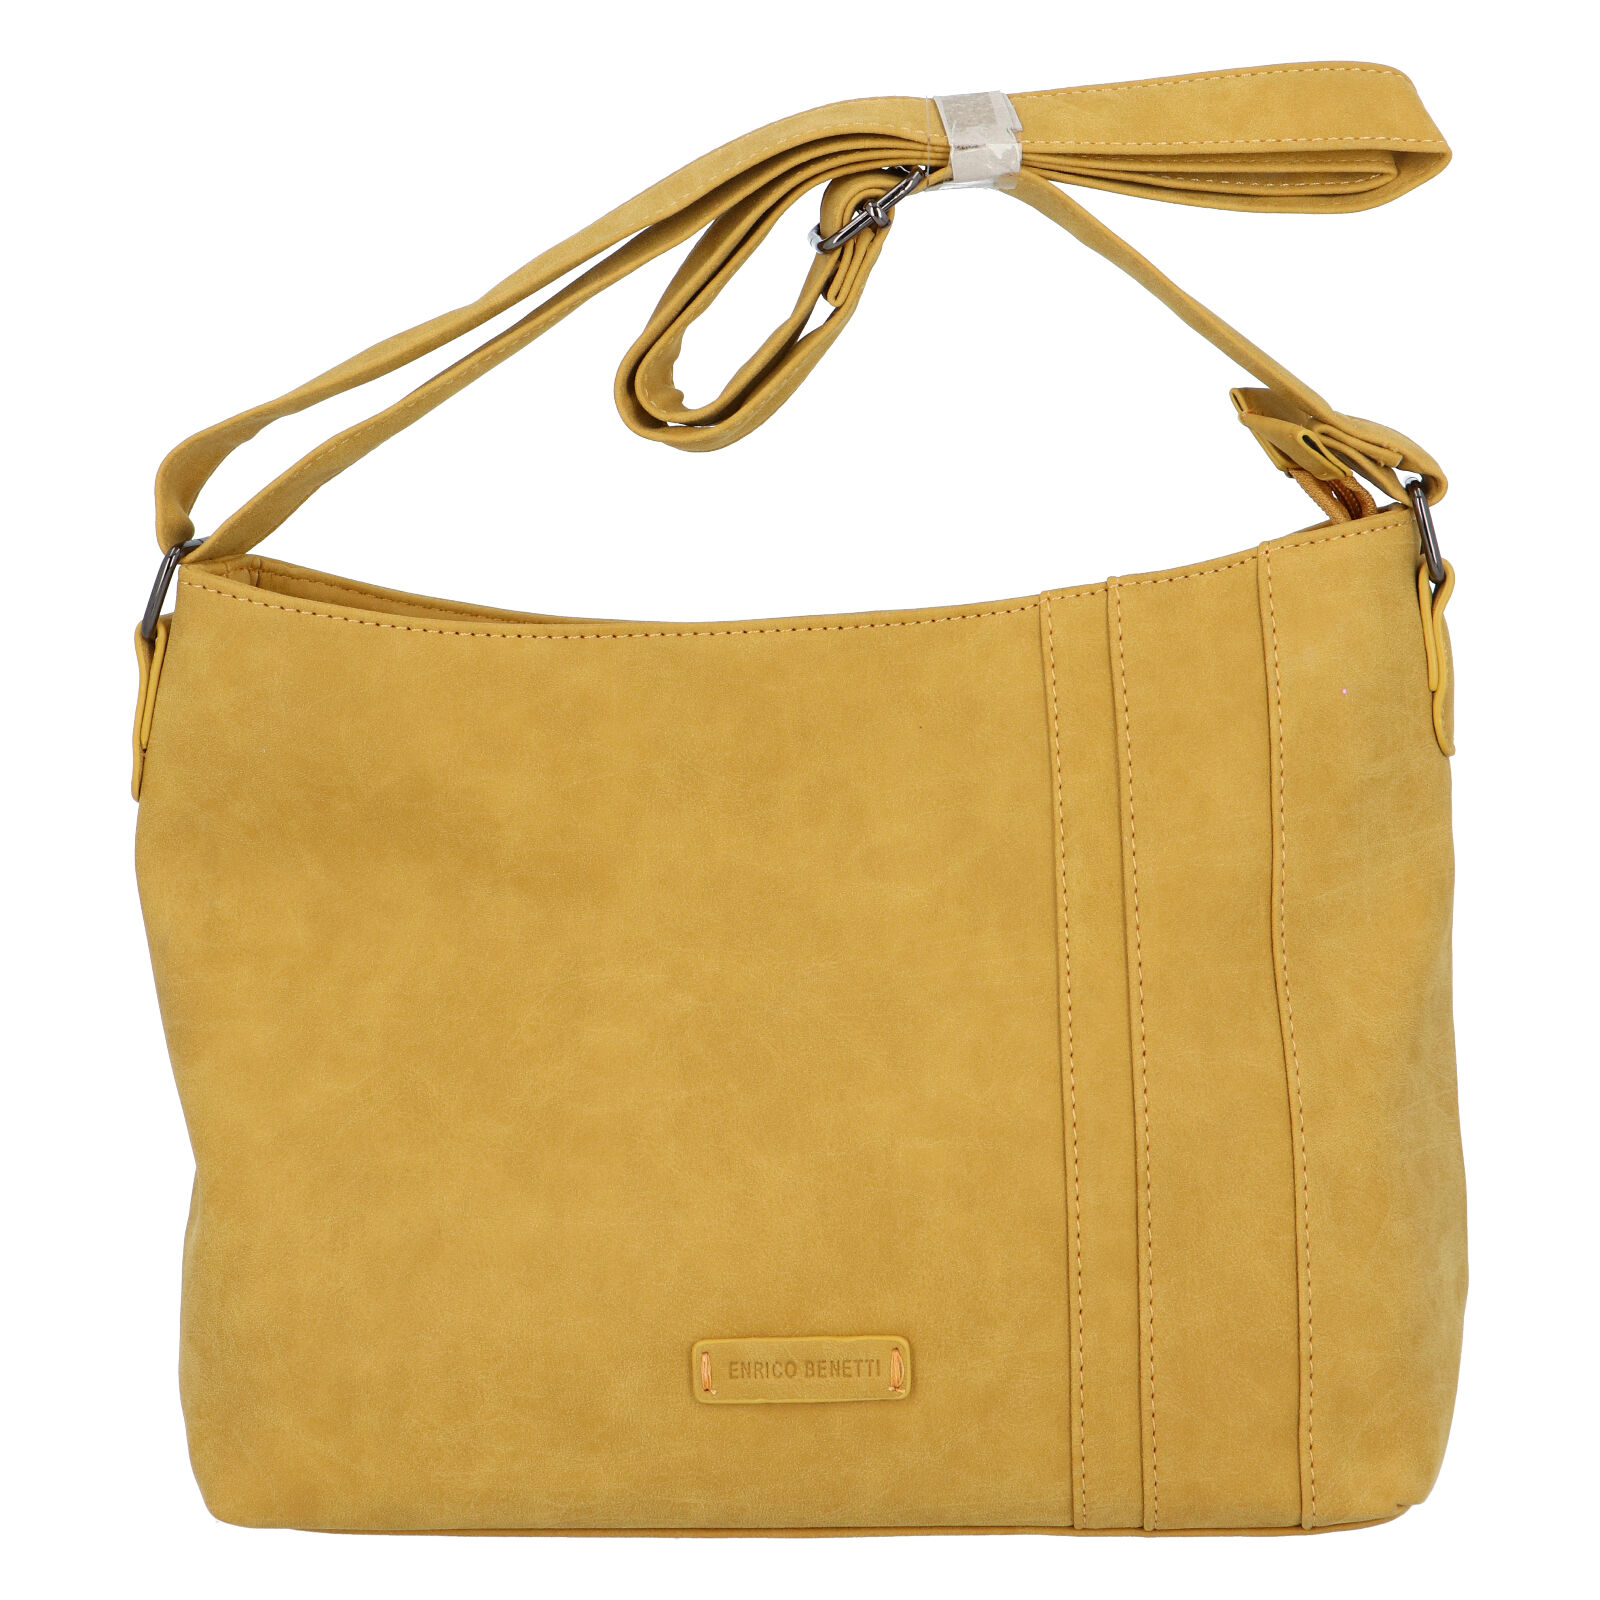 Dámská crossbody kabelka žlutá - Enrico Benetti Marina žlutá